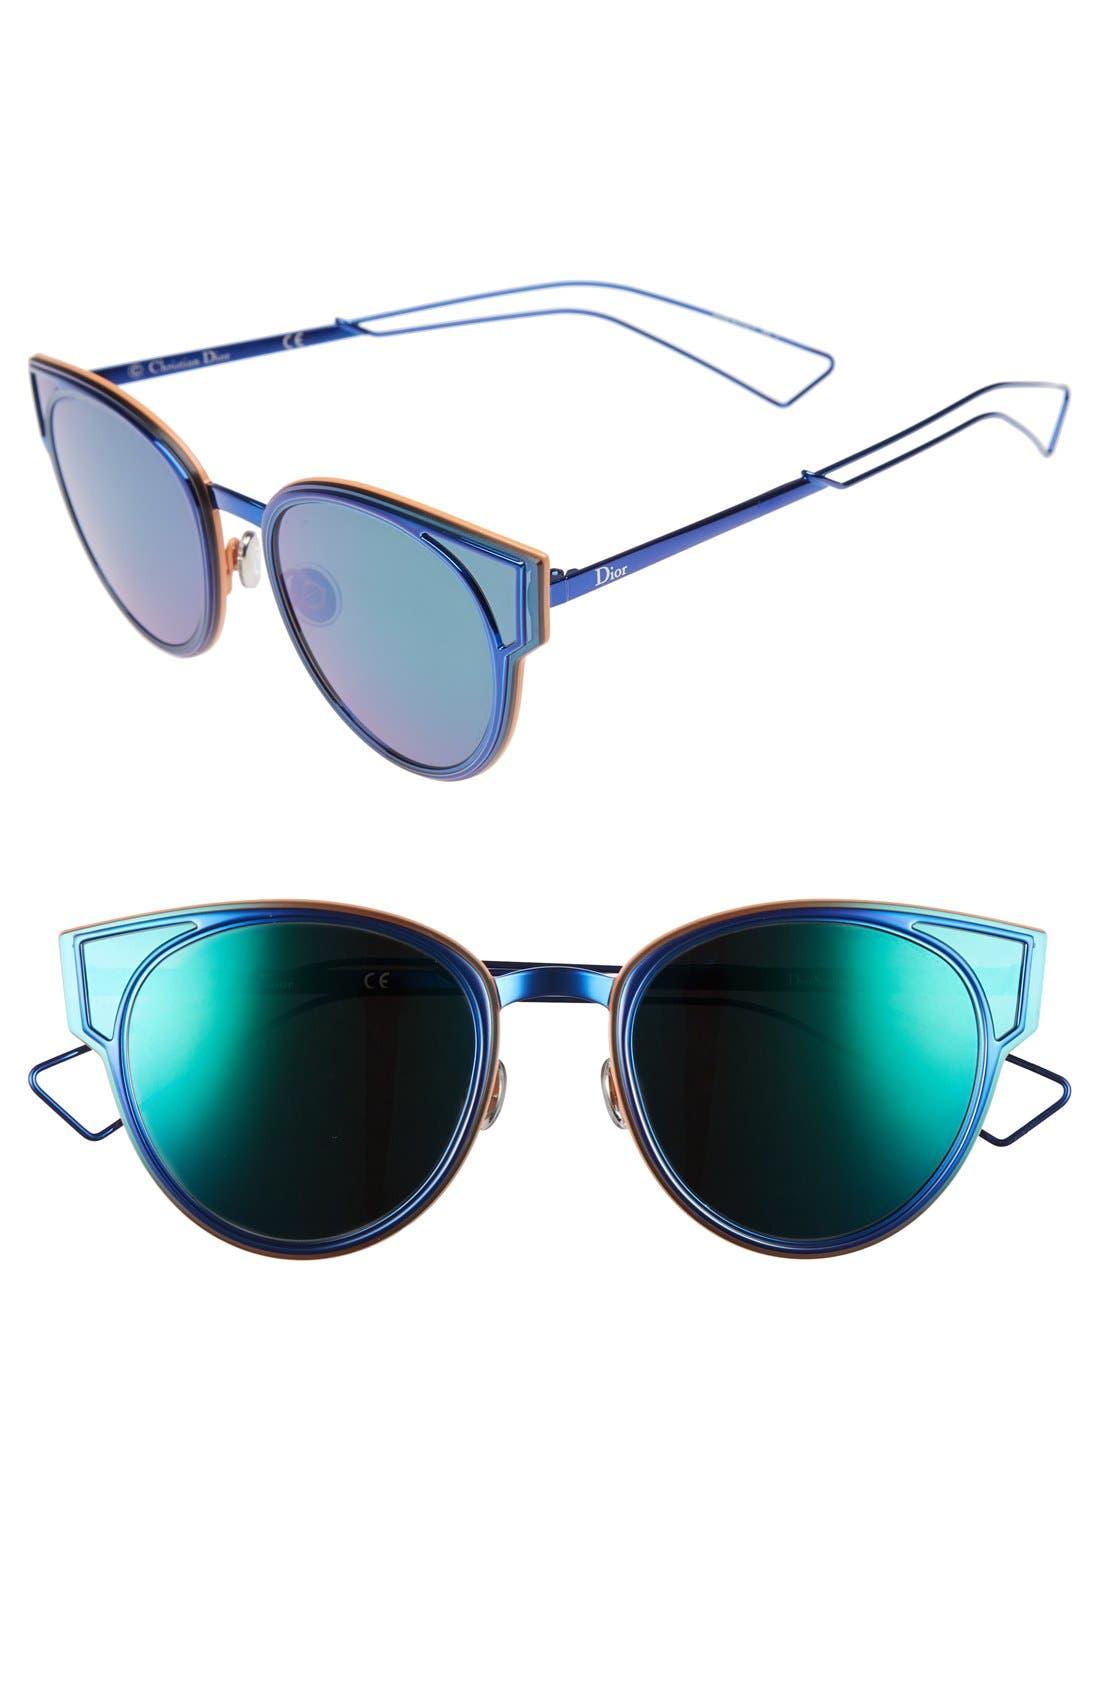 Main Image - Dior Sculpts 53mm Cat Eye Sunglasses